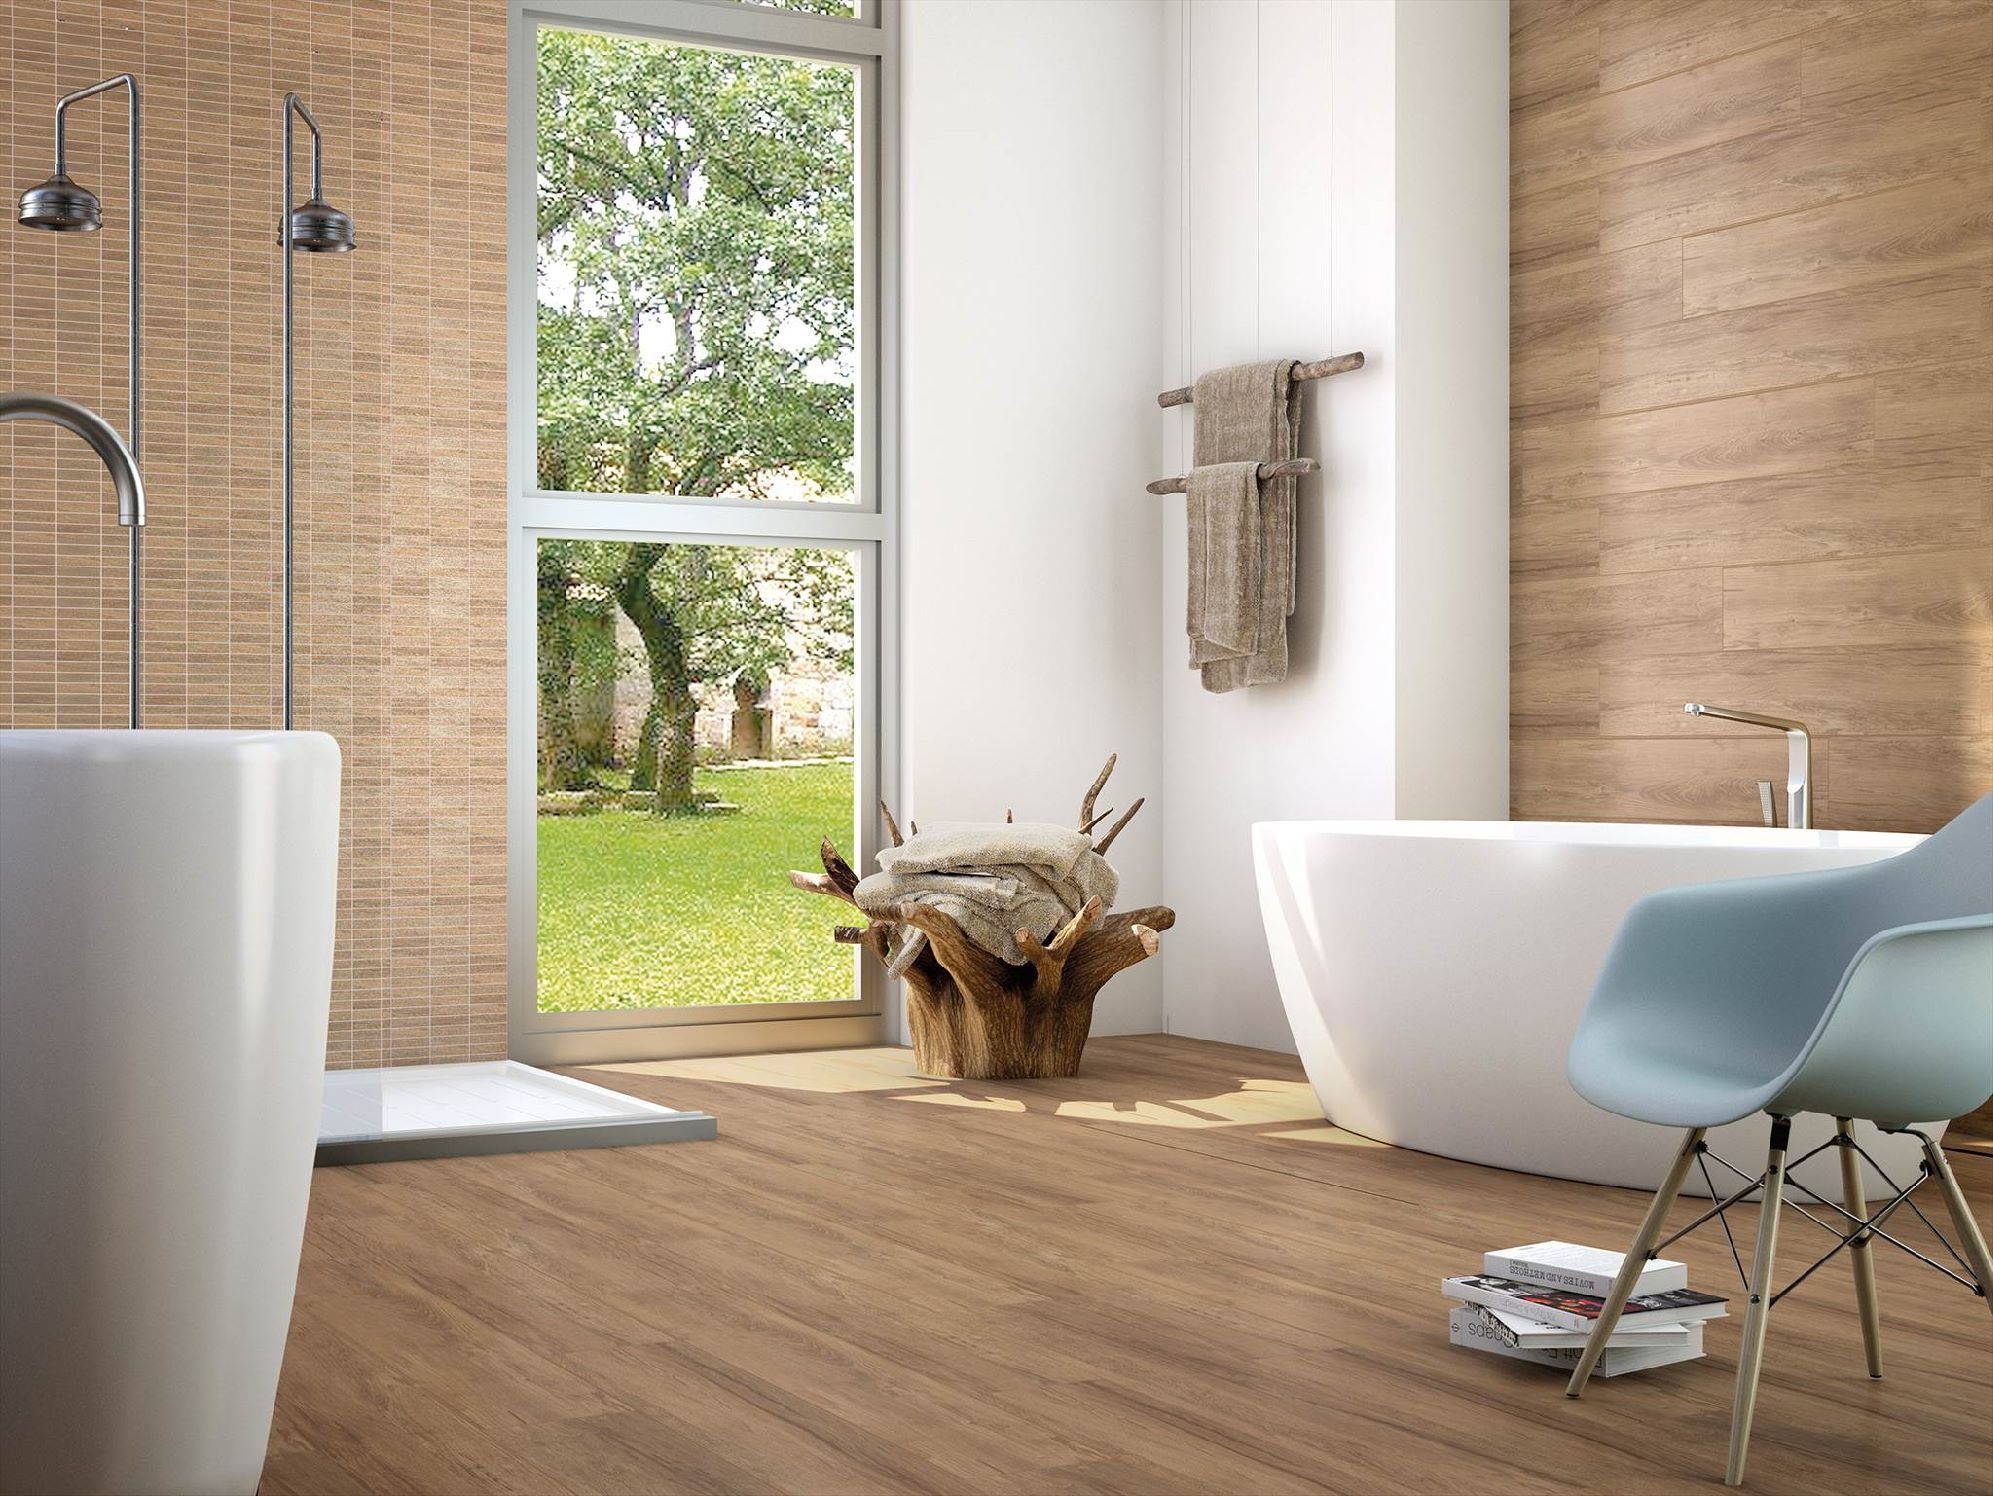 Bathroom tile wood look - Casona Beige 8 X 48 Porcelain Wood Look Tile